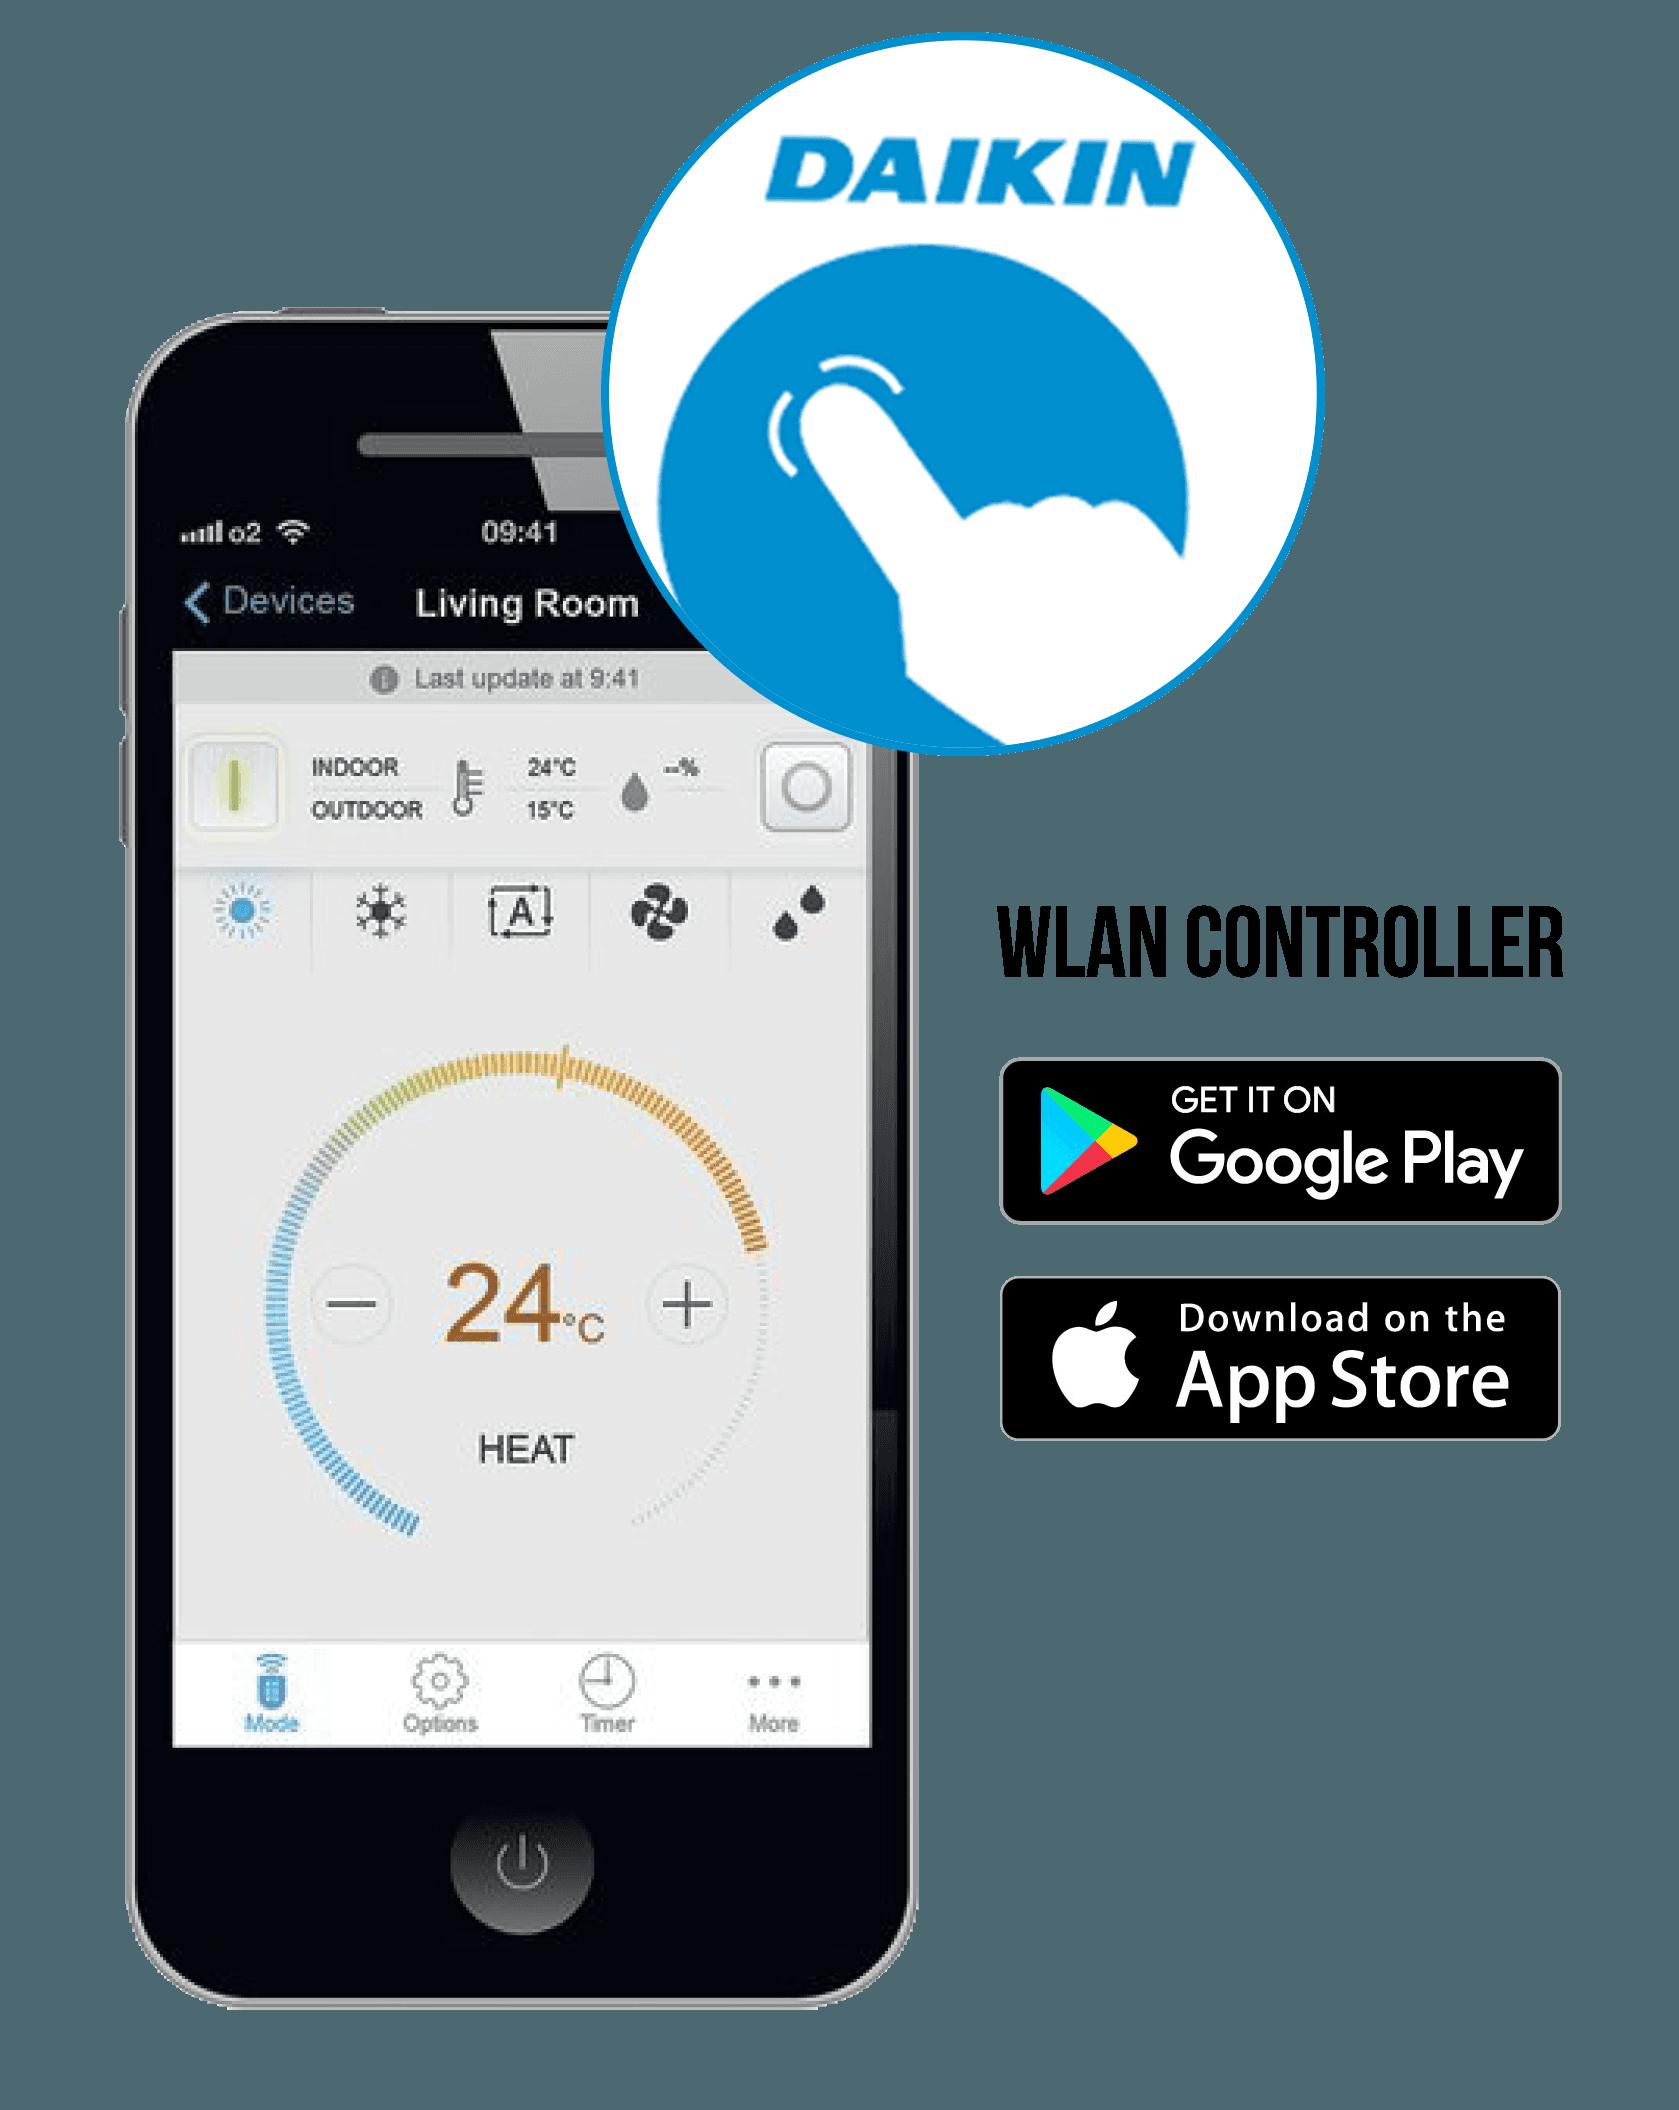 applicazione mobile by Daikin